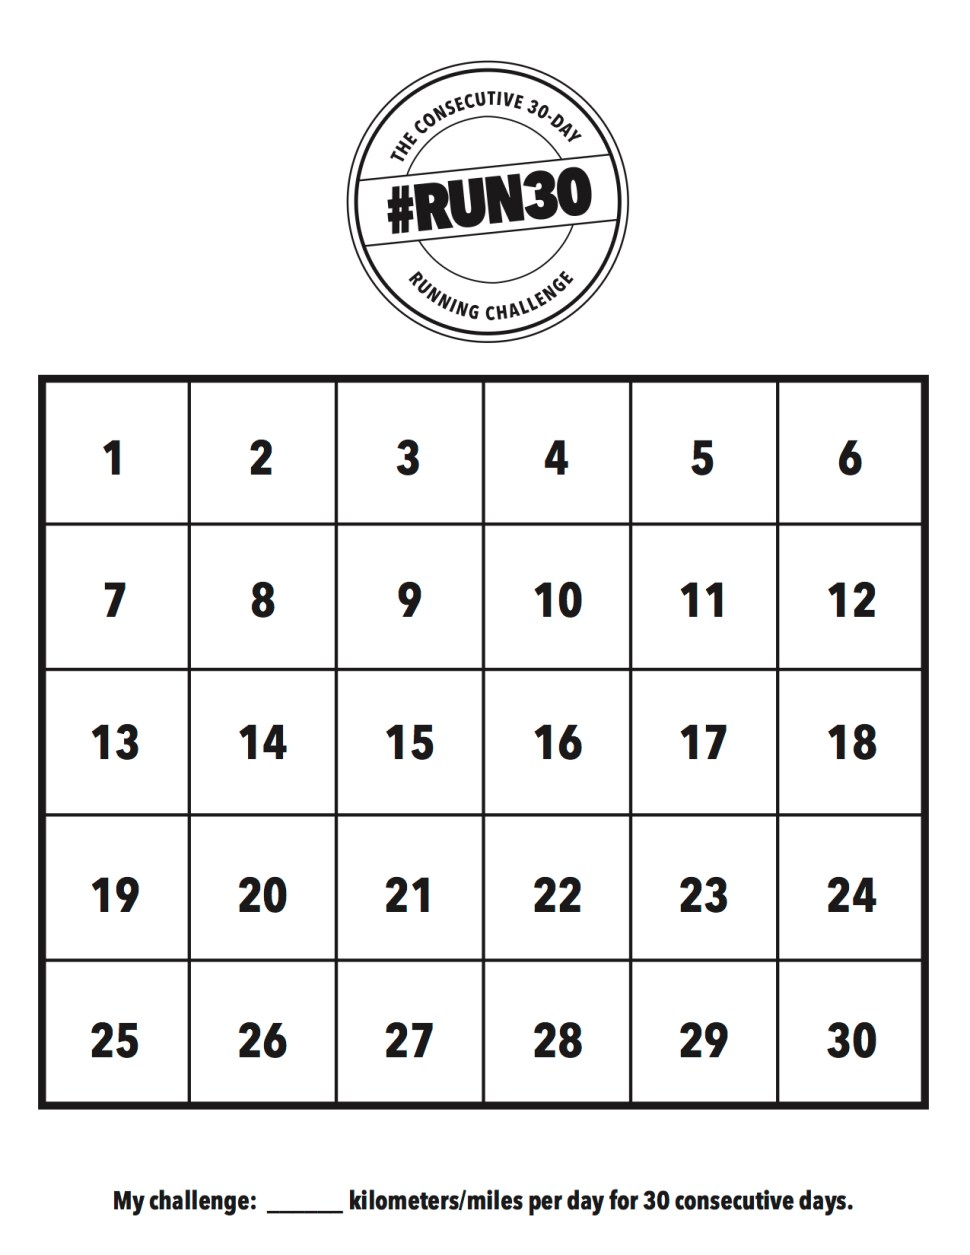 RUN30 Prtinable Calendar